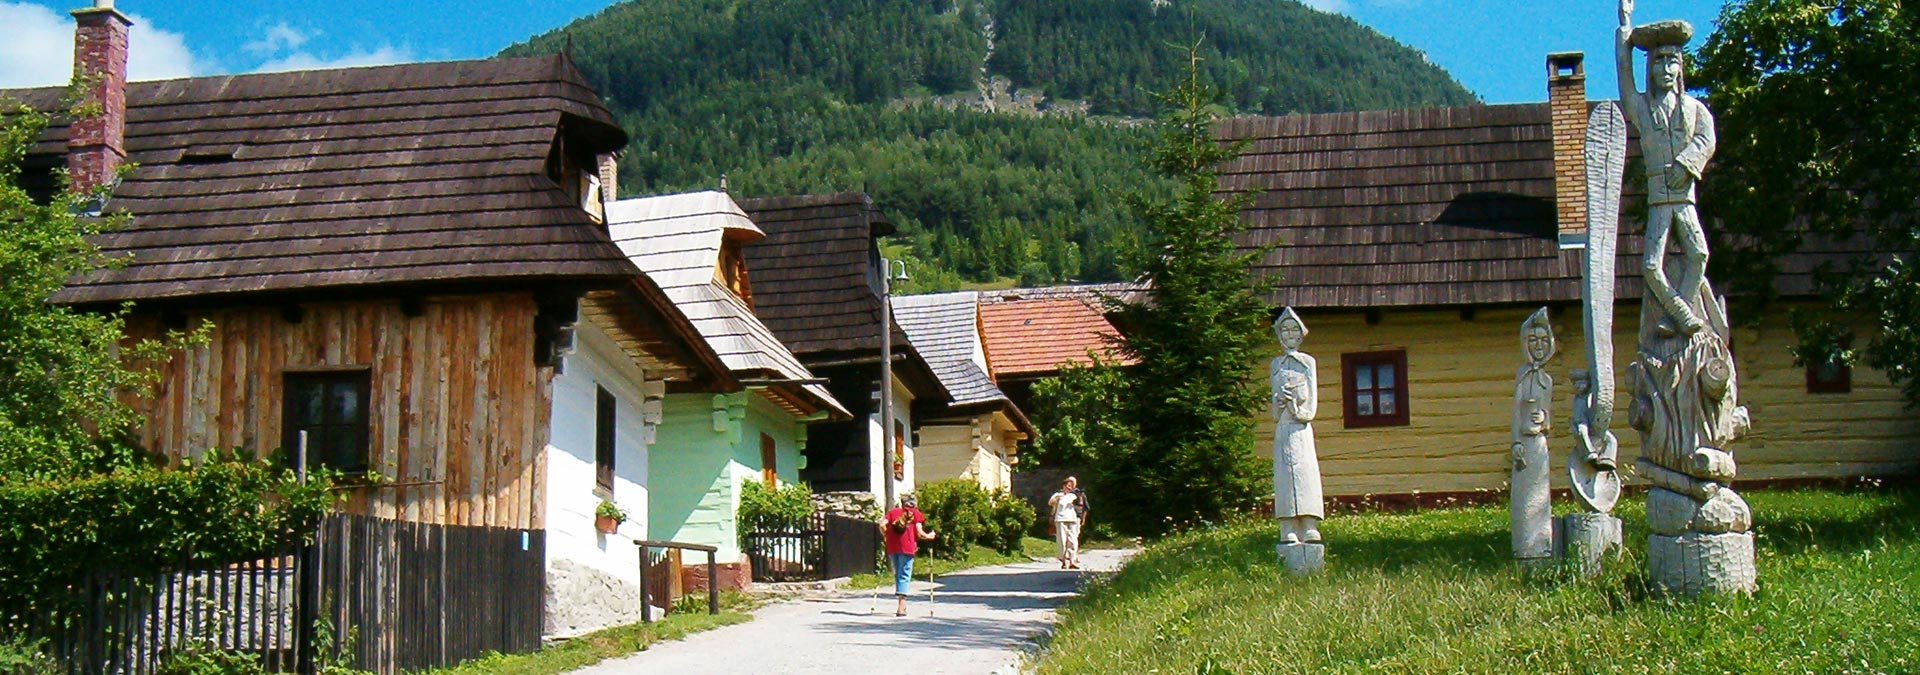 Cycling Tour from Slovak UNESCO to UNESCO Sites - from Bardejov to Banska Stiavnica, Slovakia Travel, Location